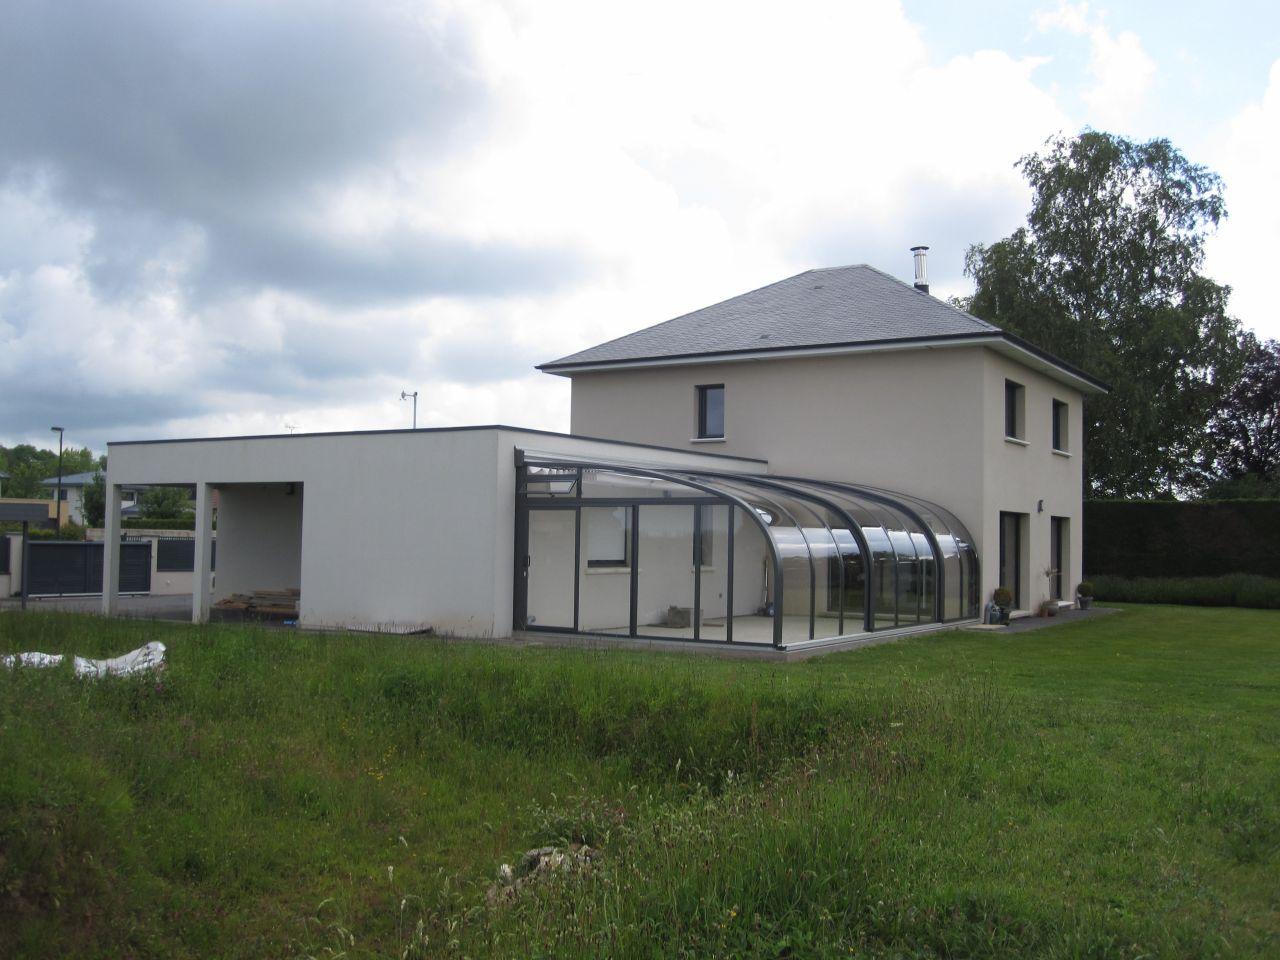 véranda Voroka ou abri de terrasse Voroeka saphir, gris anthracite